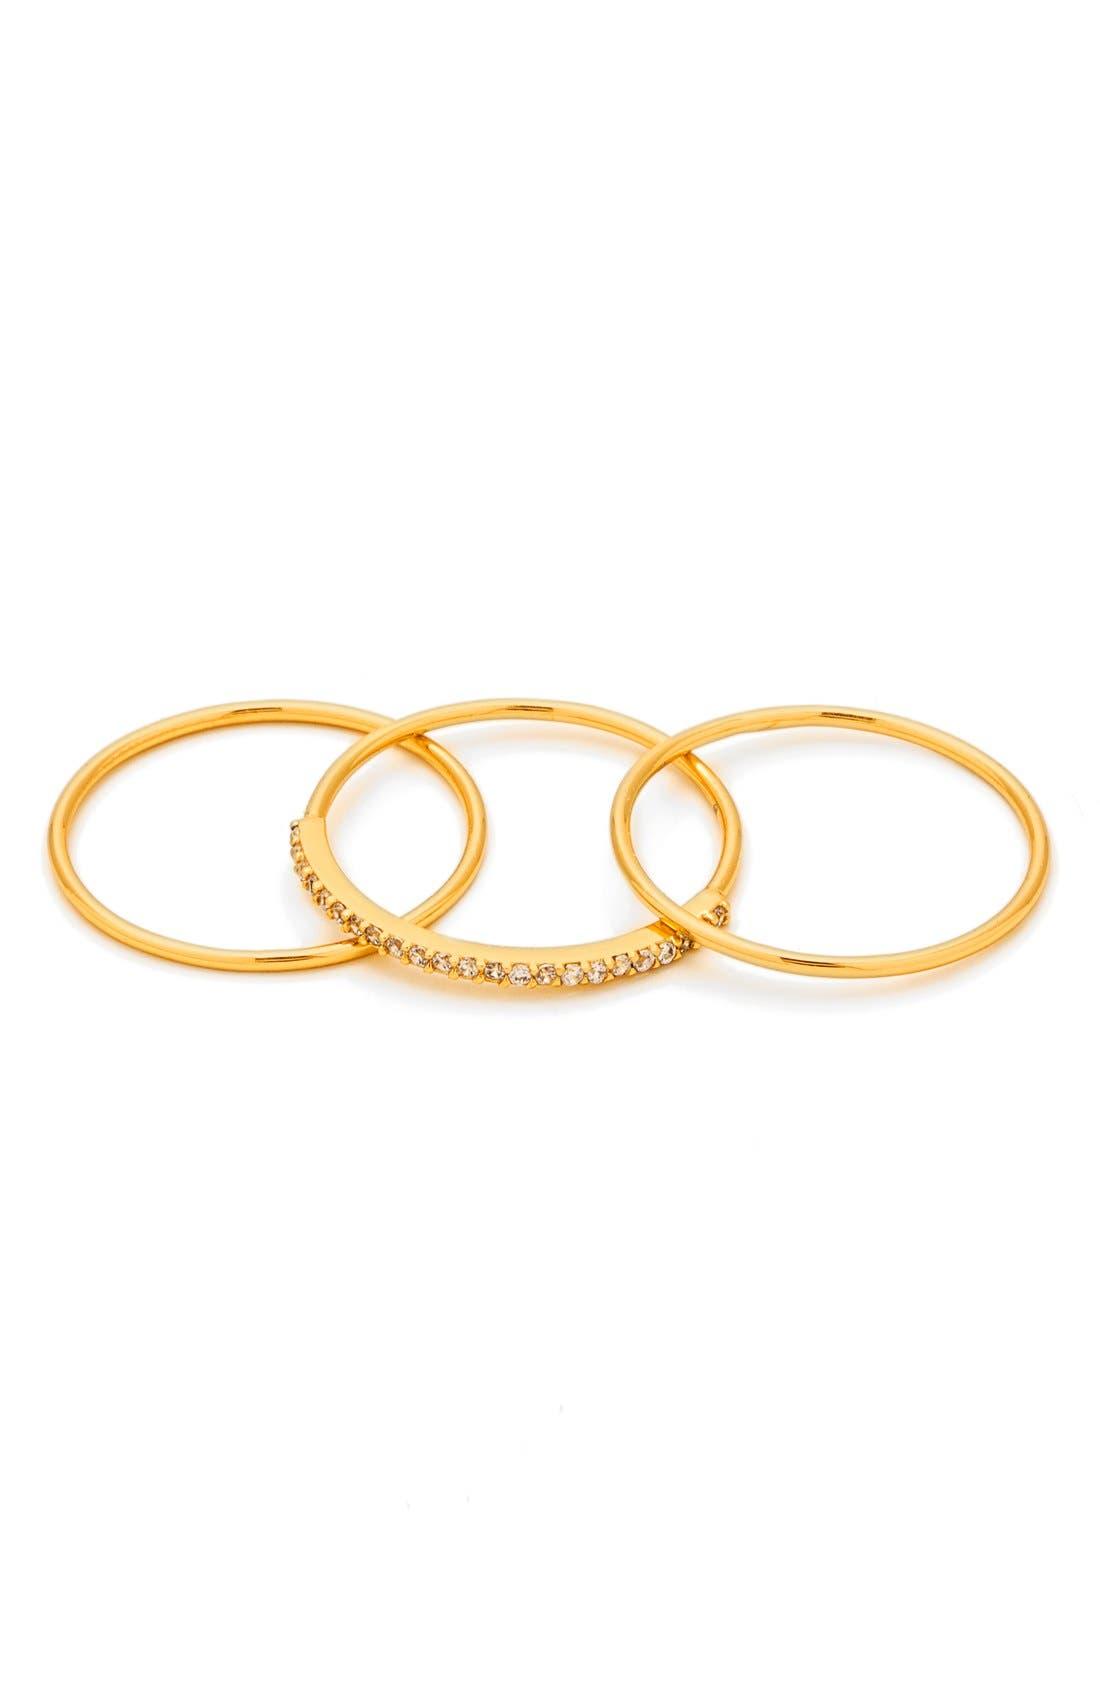 Shimmer Stackable Set of 3 Band Rings,                             Main thumbnail 1, color,                             710